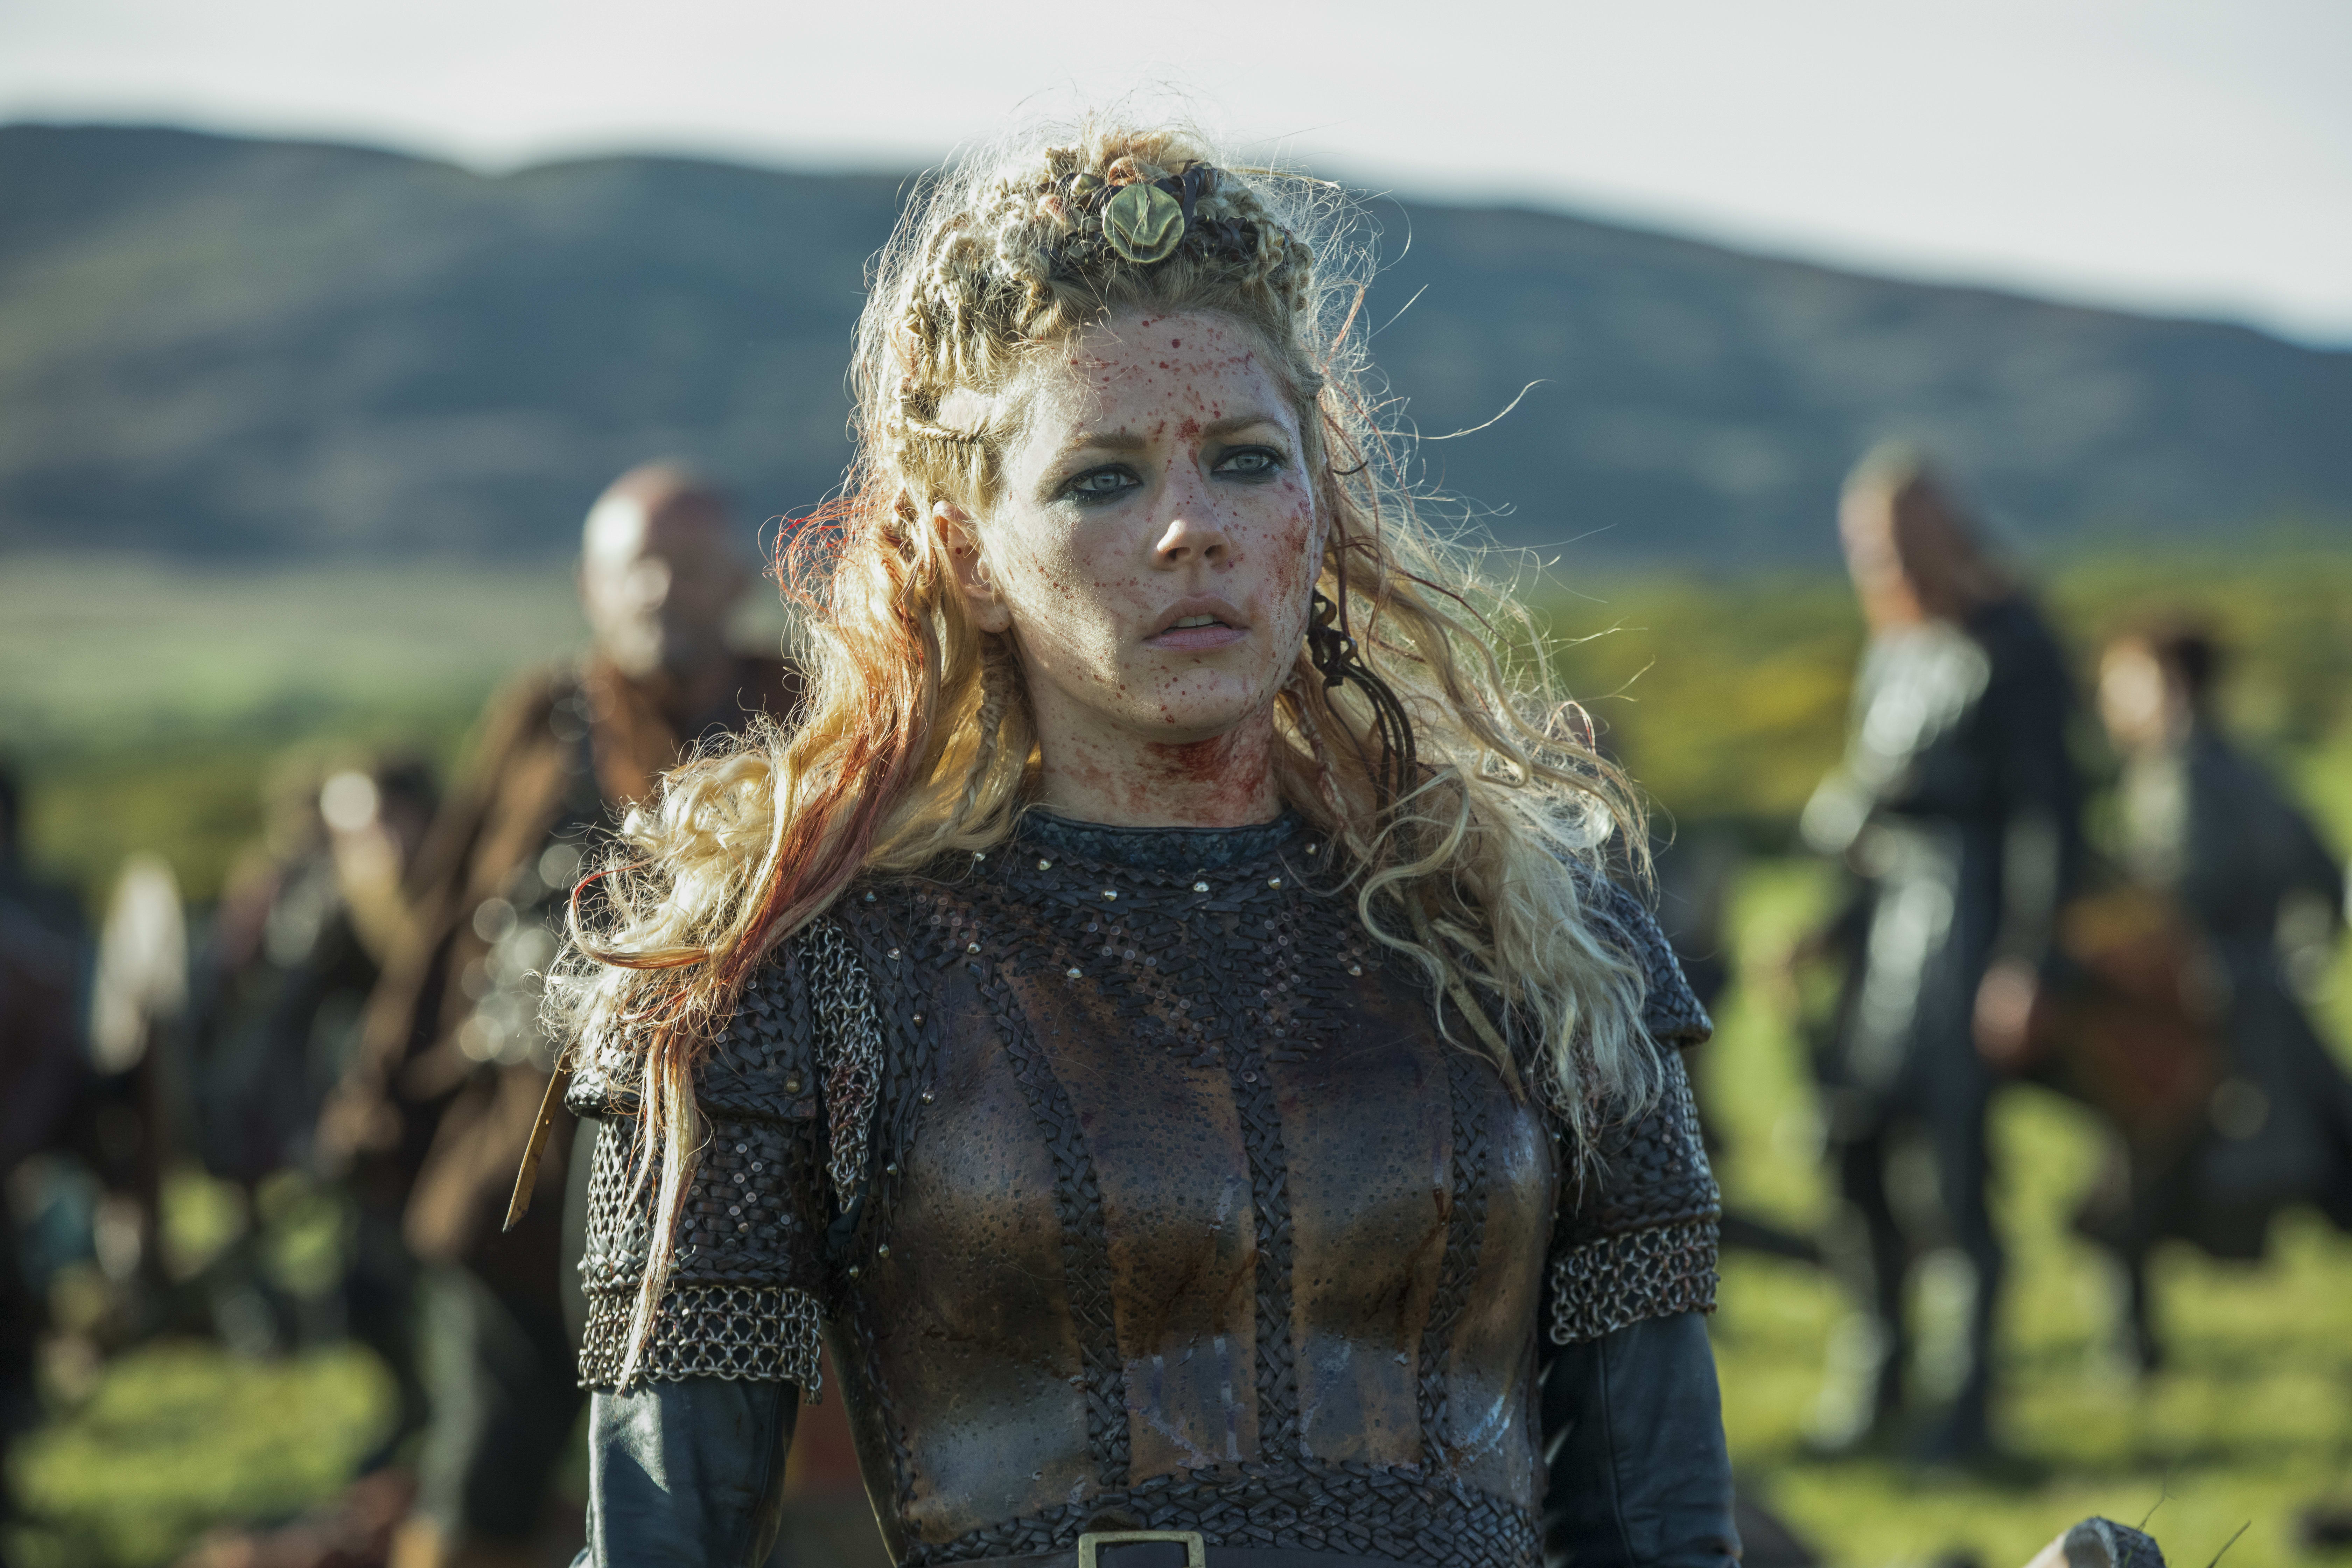 Vikings Season 5 Episode 1: